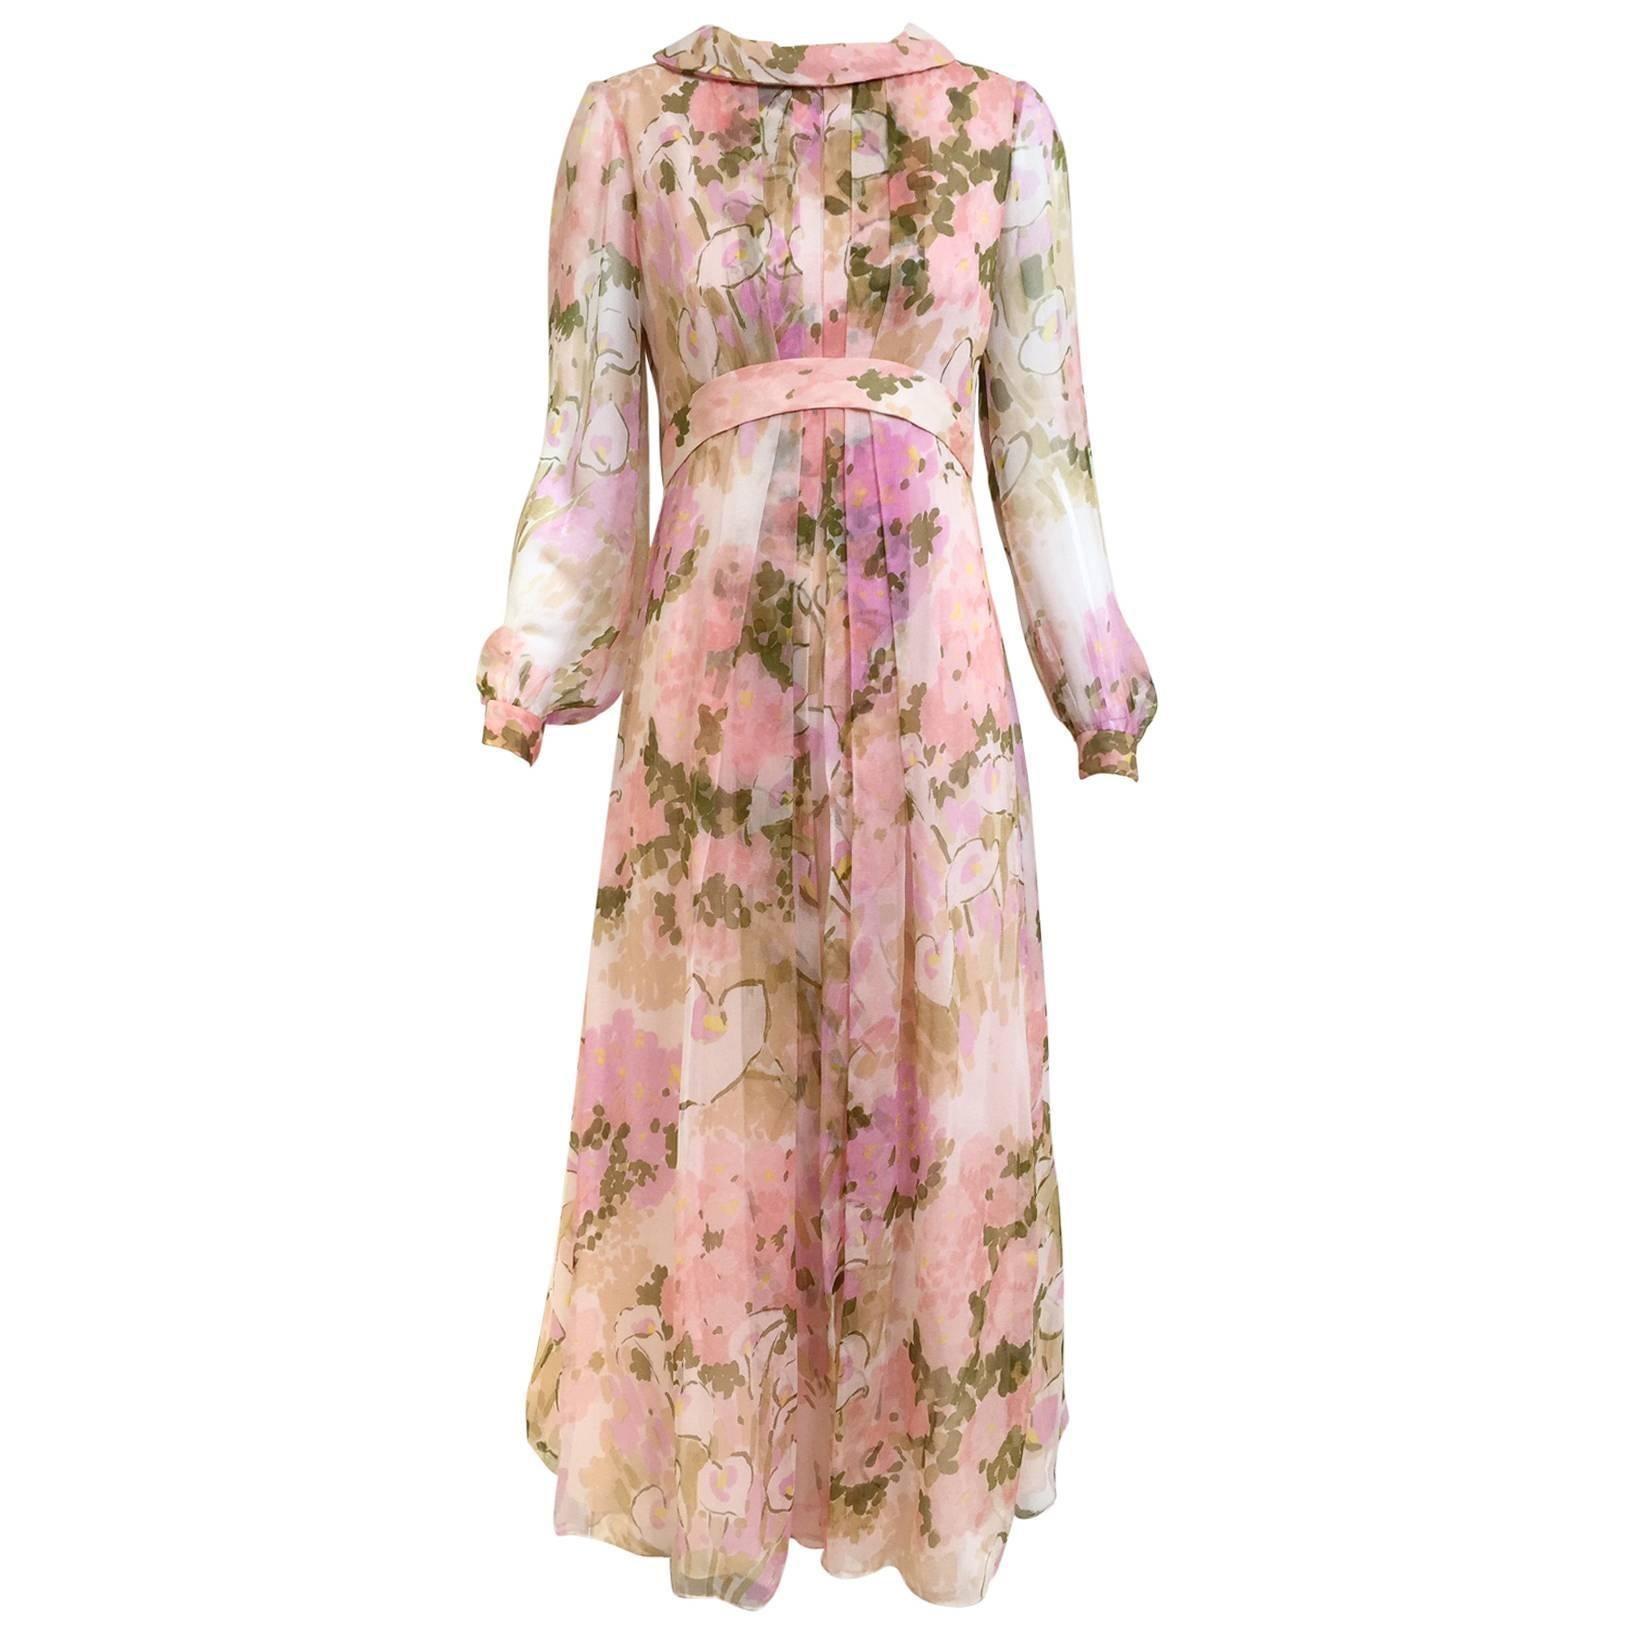 1970s Pink Floral Print Silk Chiffon Long Sleeve Maxi Dress